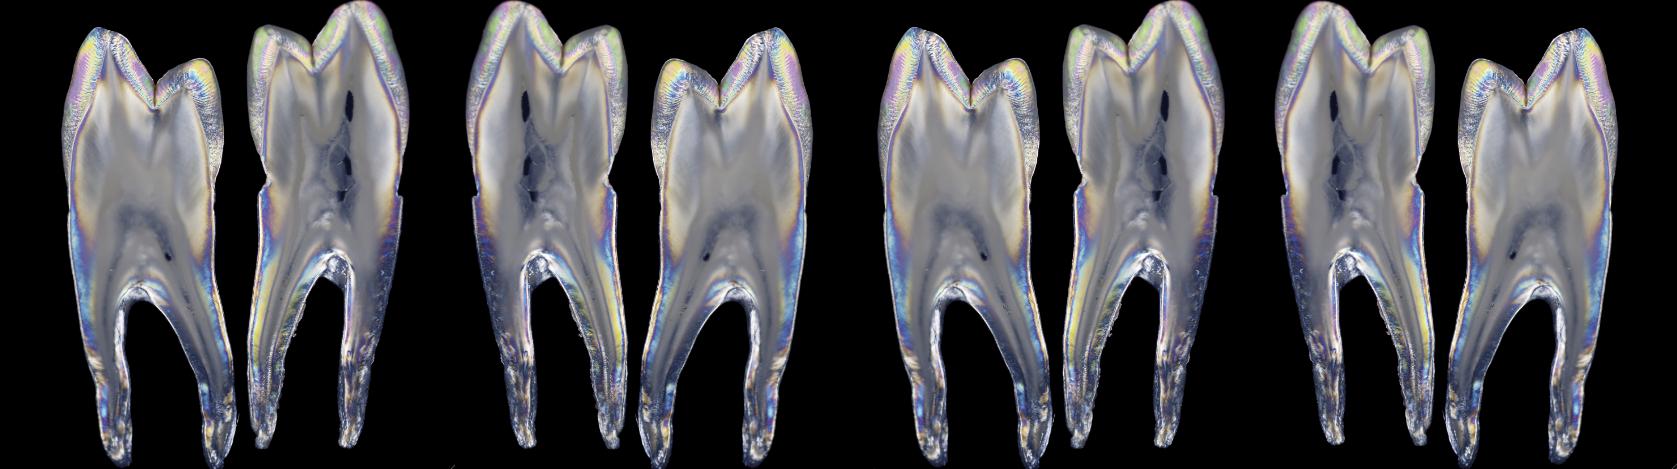 Zahnarzt Hamm Detox dentistry 001